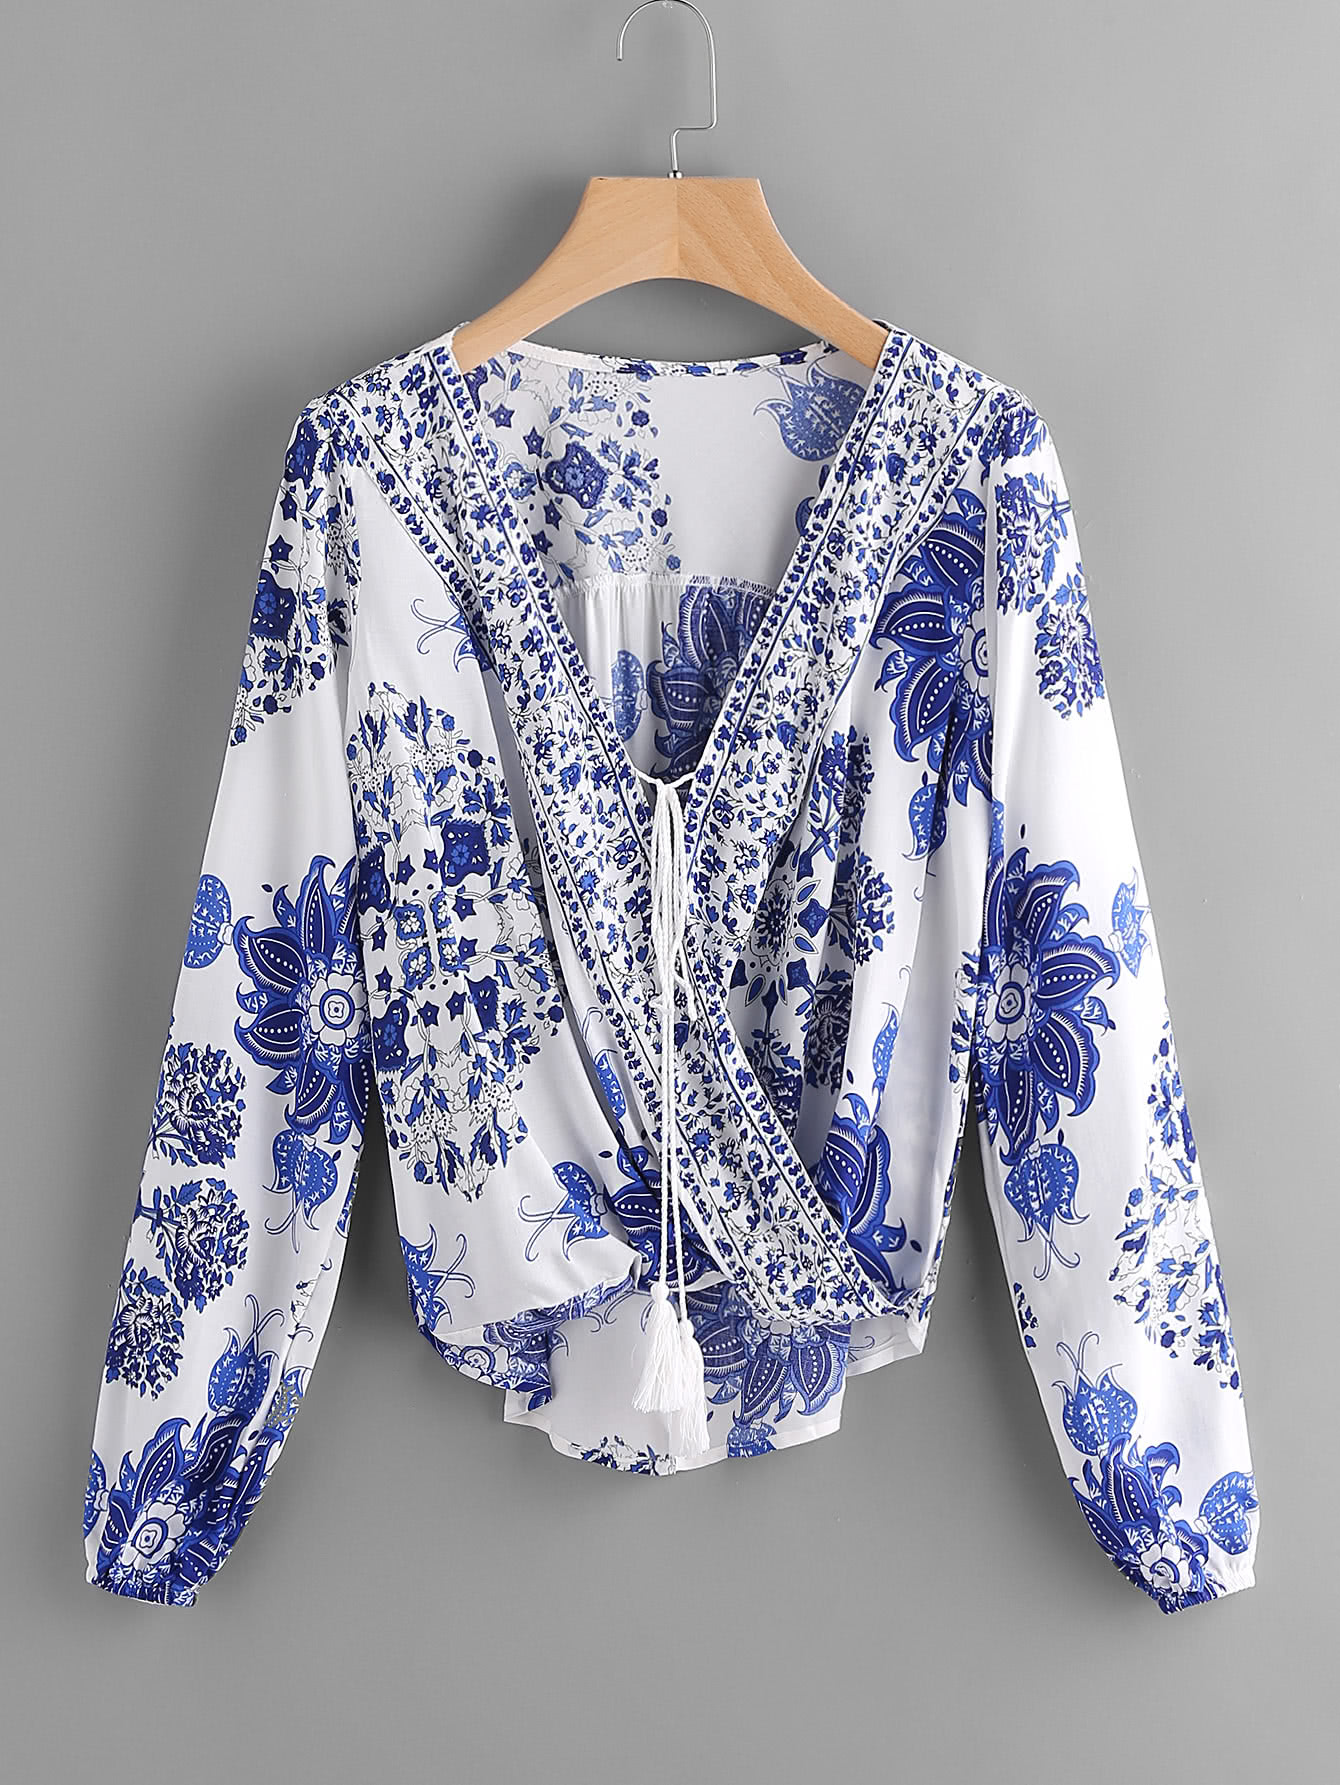 Surplice Neckline Tassel Tie Printed Blouse crisscross surplice neckline tie detail tropical print blouse